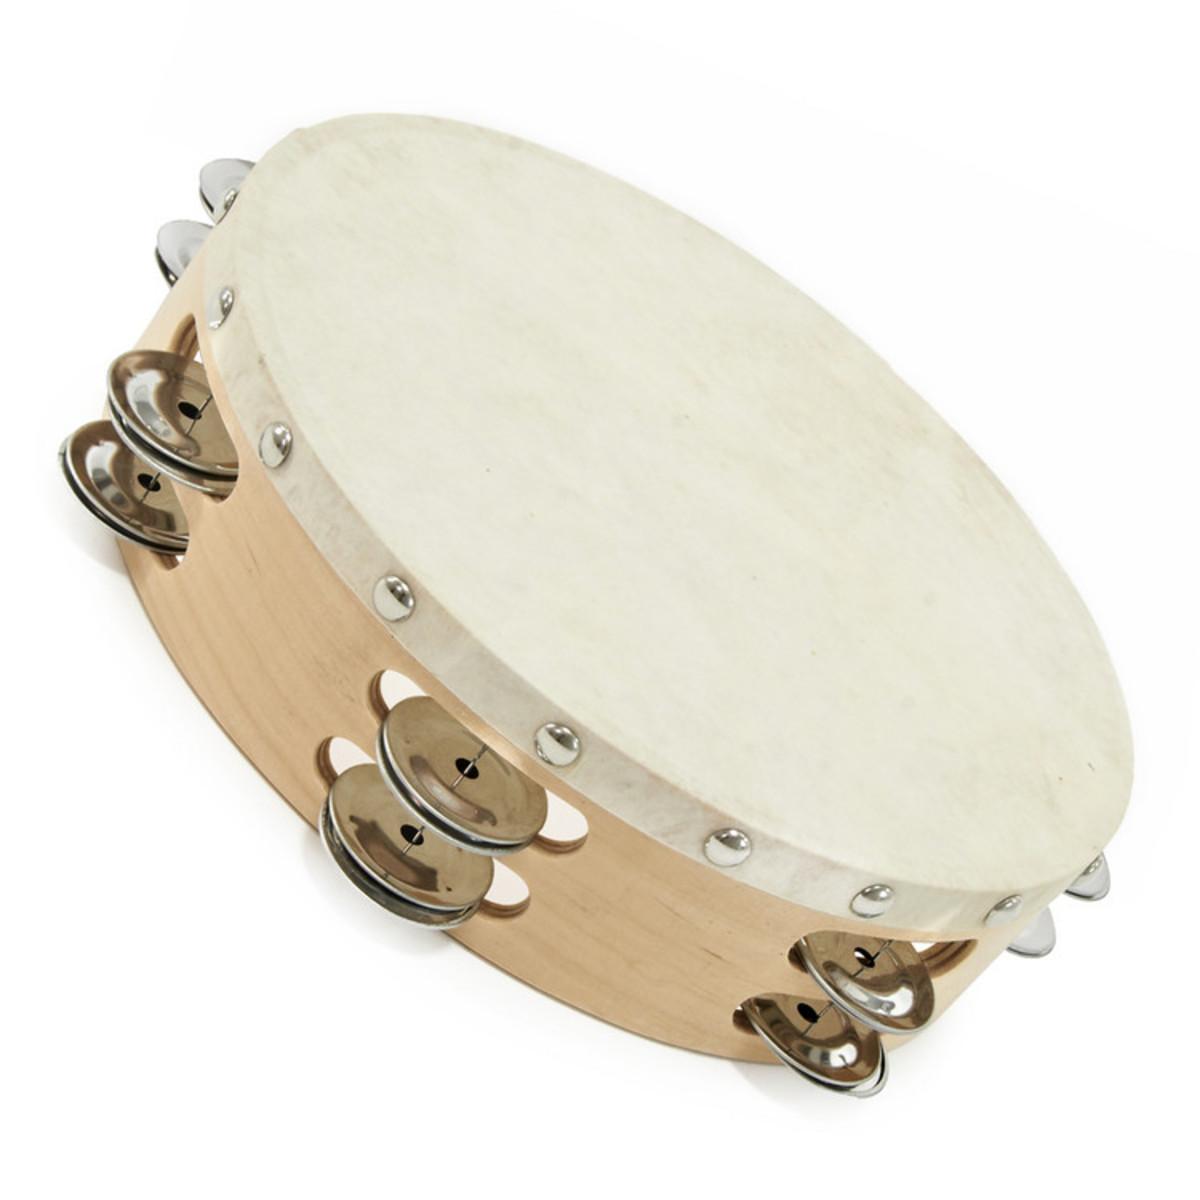 Orff Instrumente/Percussion